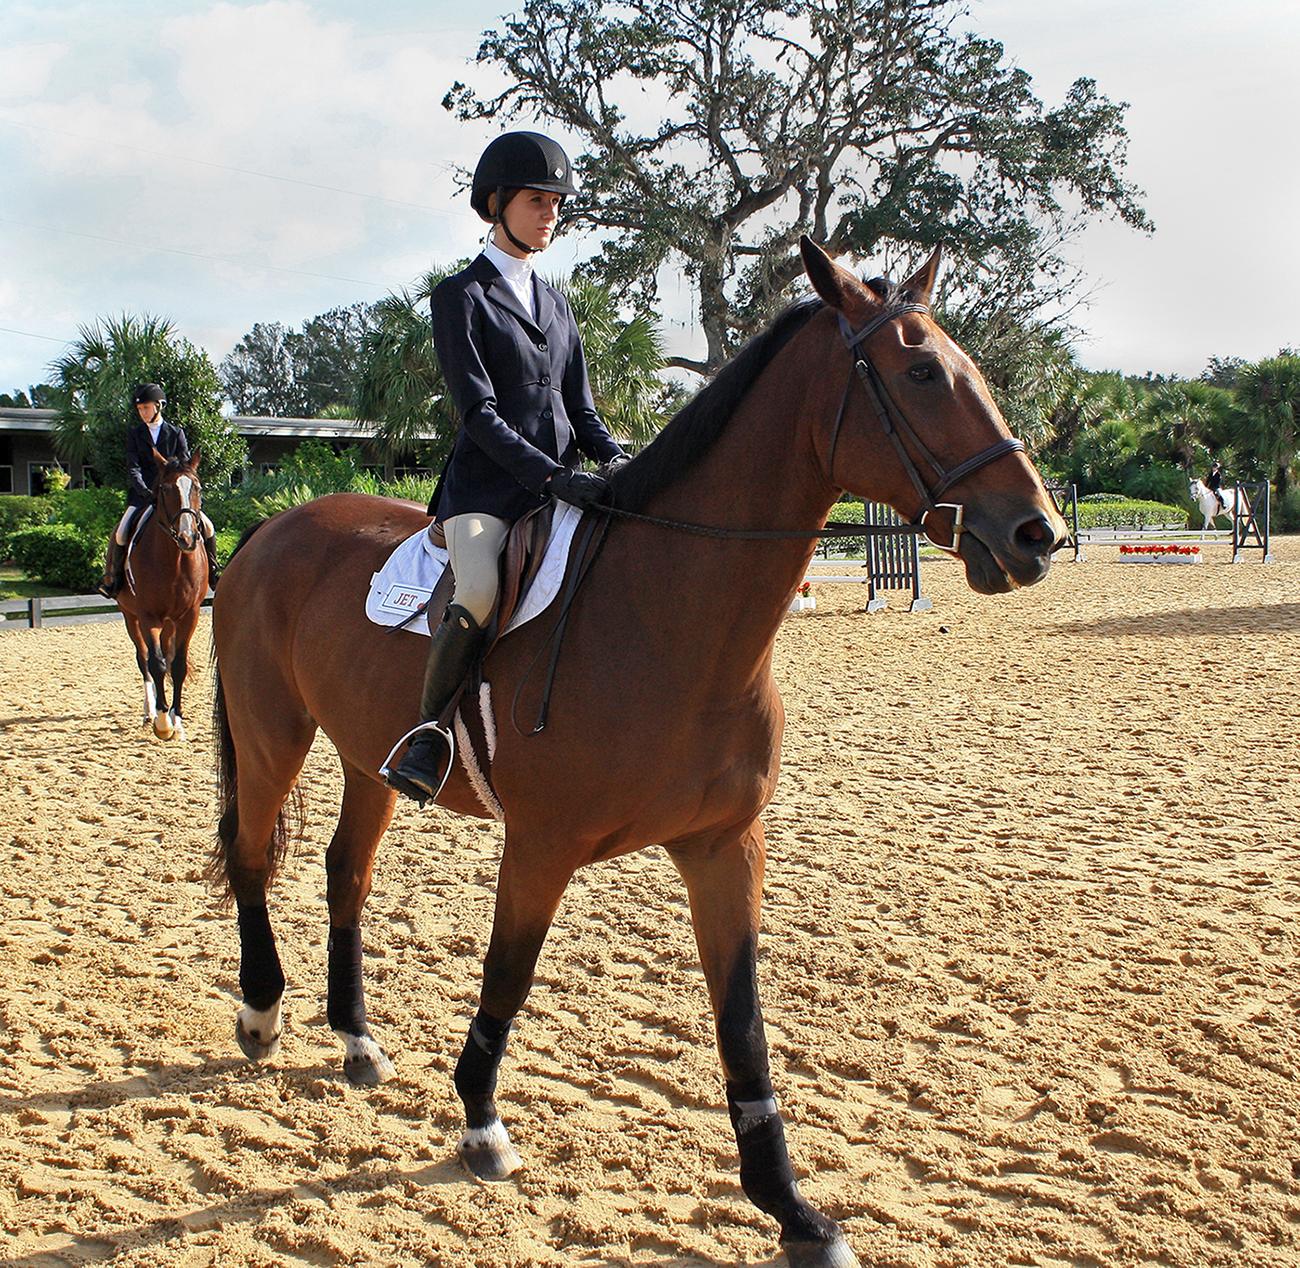 In Photos: UF Equestrian Team Starts Show Season - WUFT News